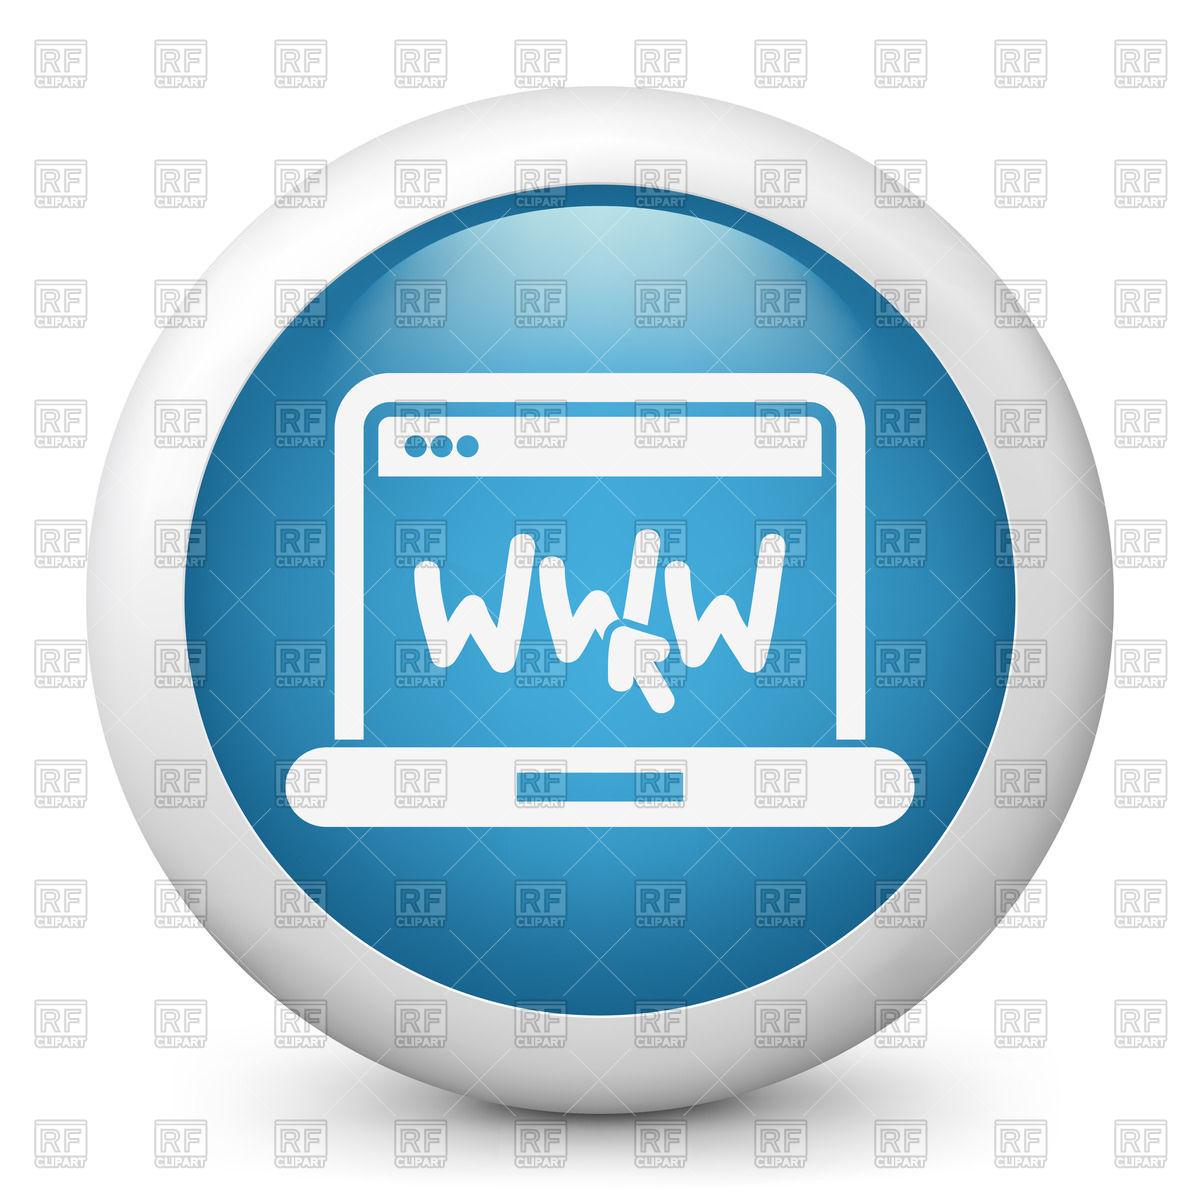 Internet (www) icon.